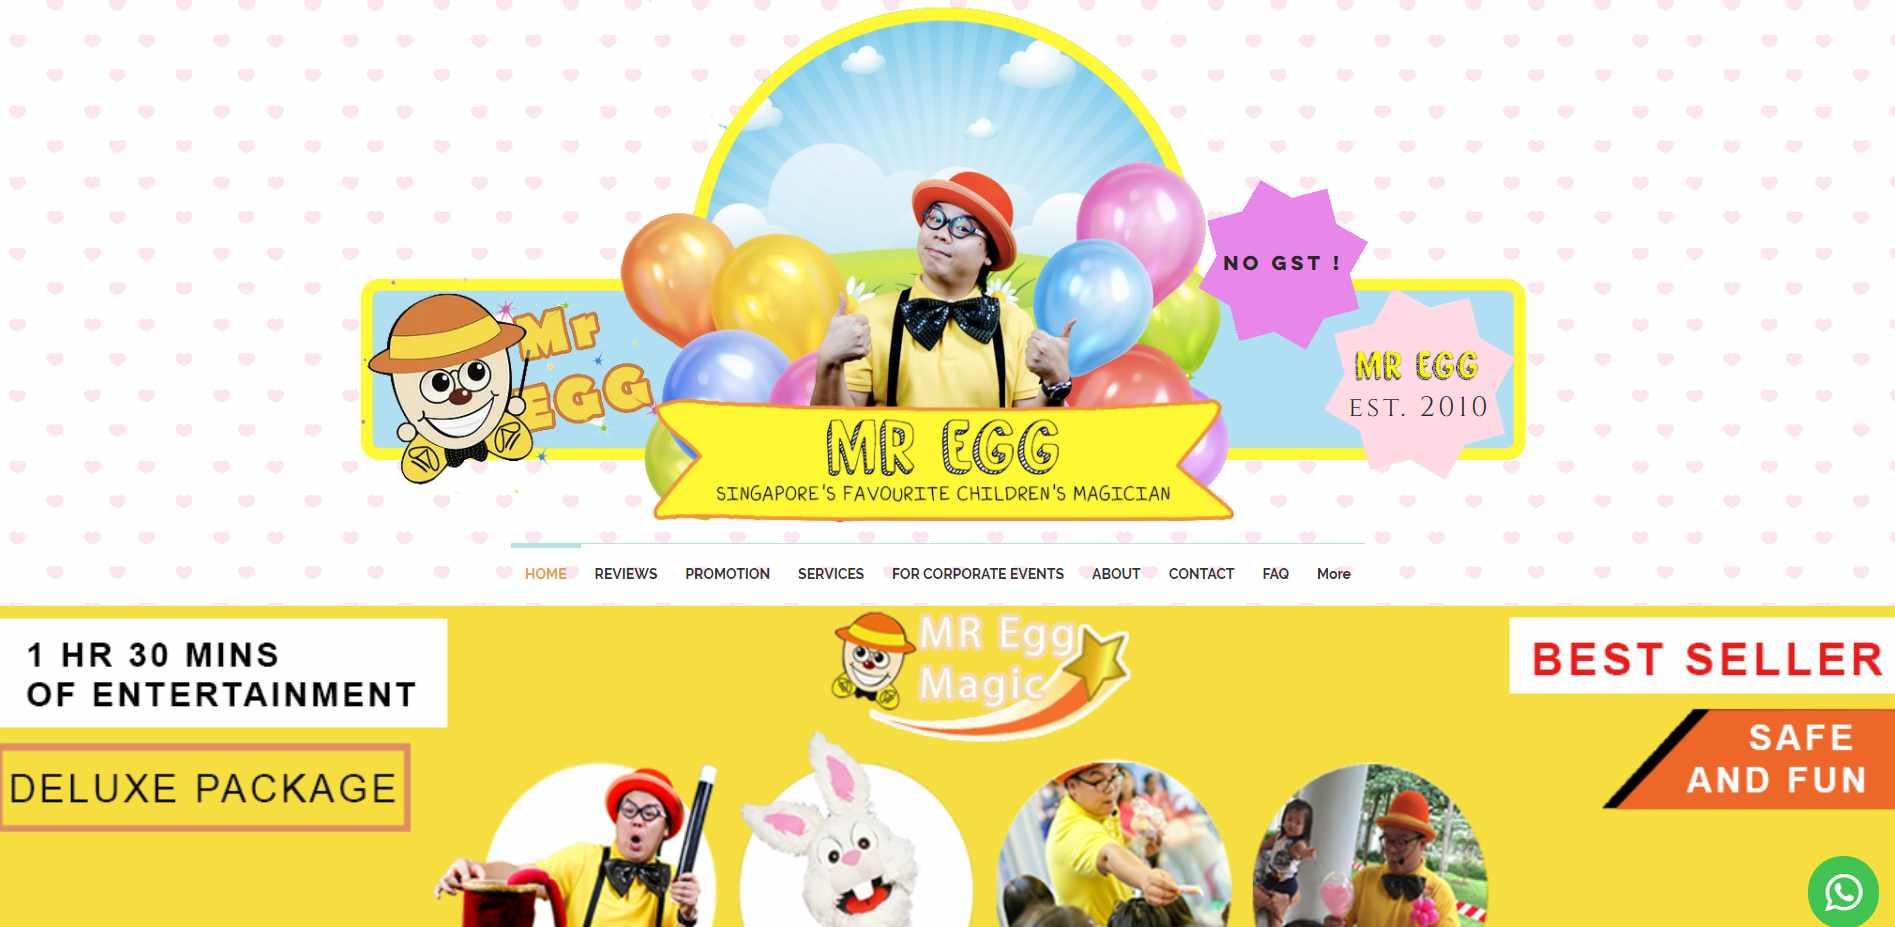 mr egg magic Top Magicians in Singapore